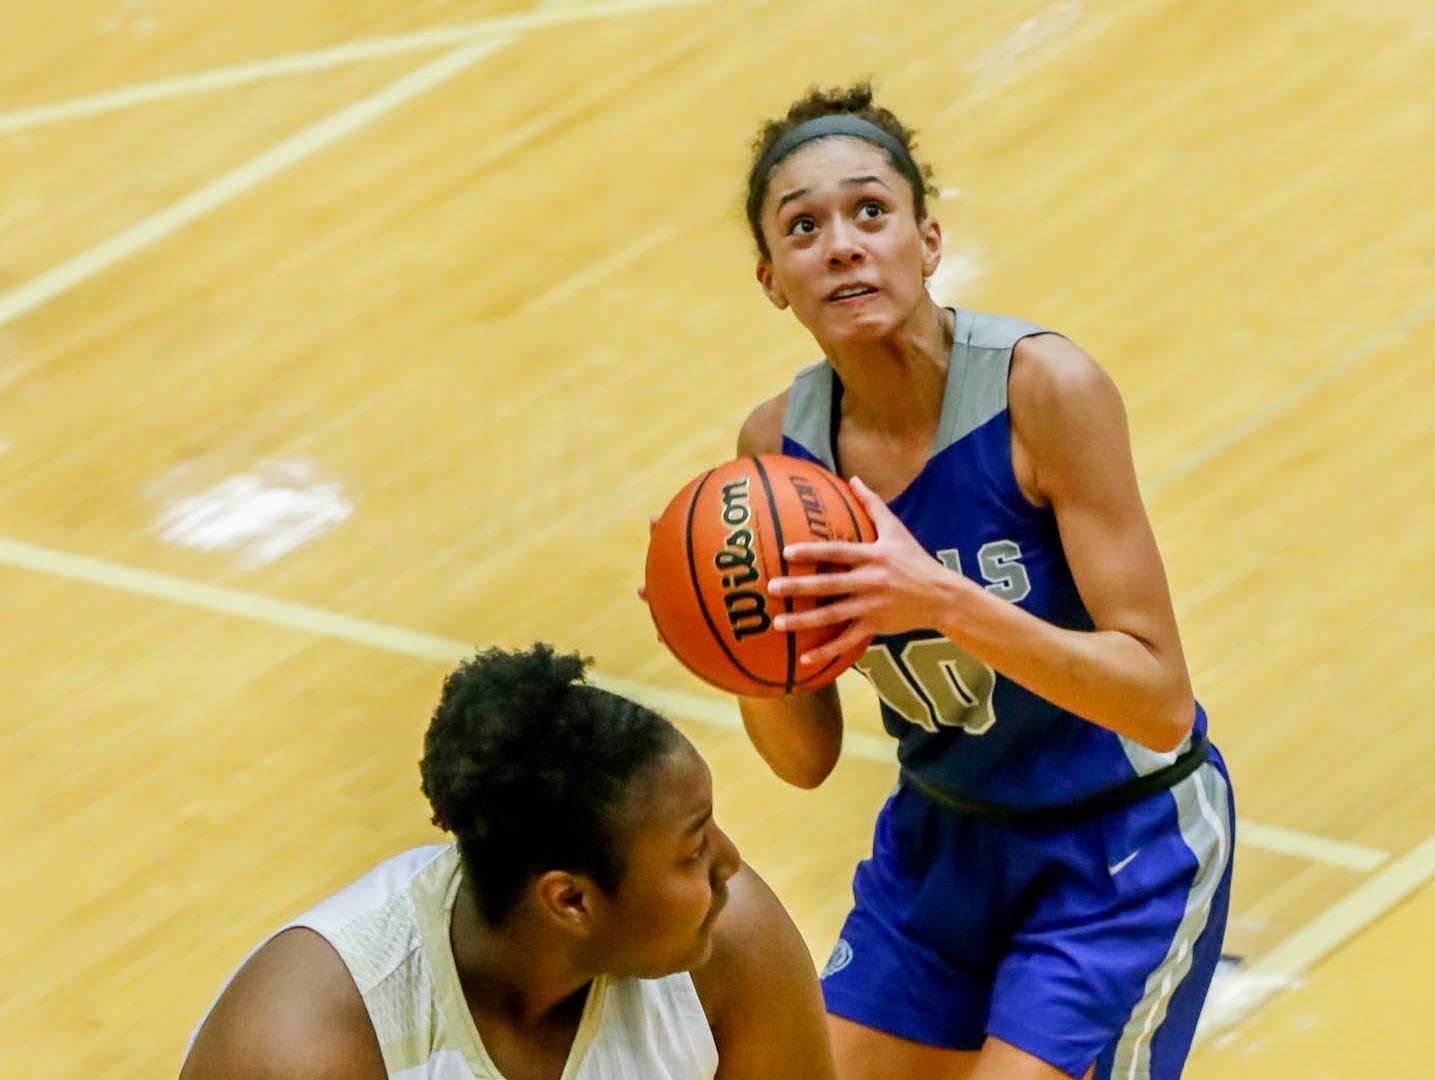 Hamilton South Eastern's Amaya Hamilton (10), shoots a basket over Warren Central High School's Cydni Dodd (50), during a game between Hamilton Southeastern High School and Warren Central High School, held at Warren on Thursday, Jan. 3, 2019.